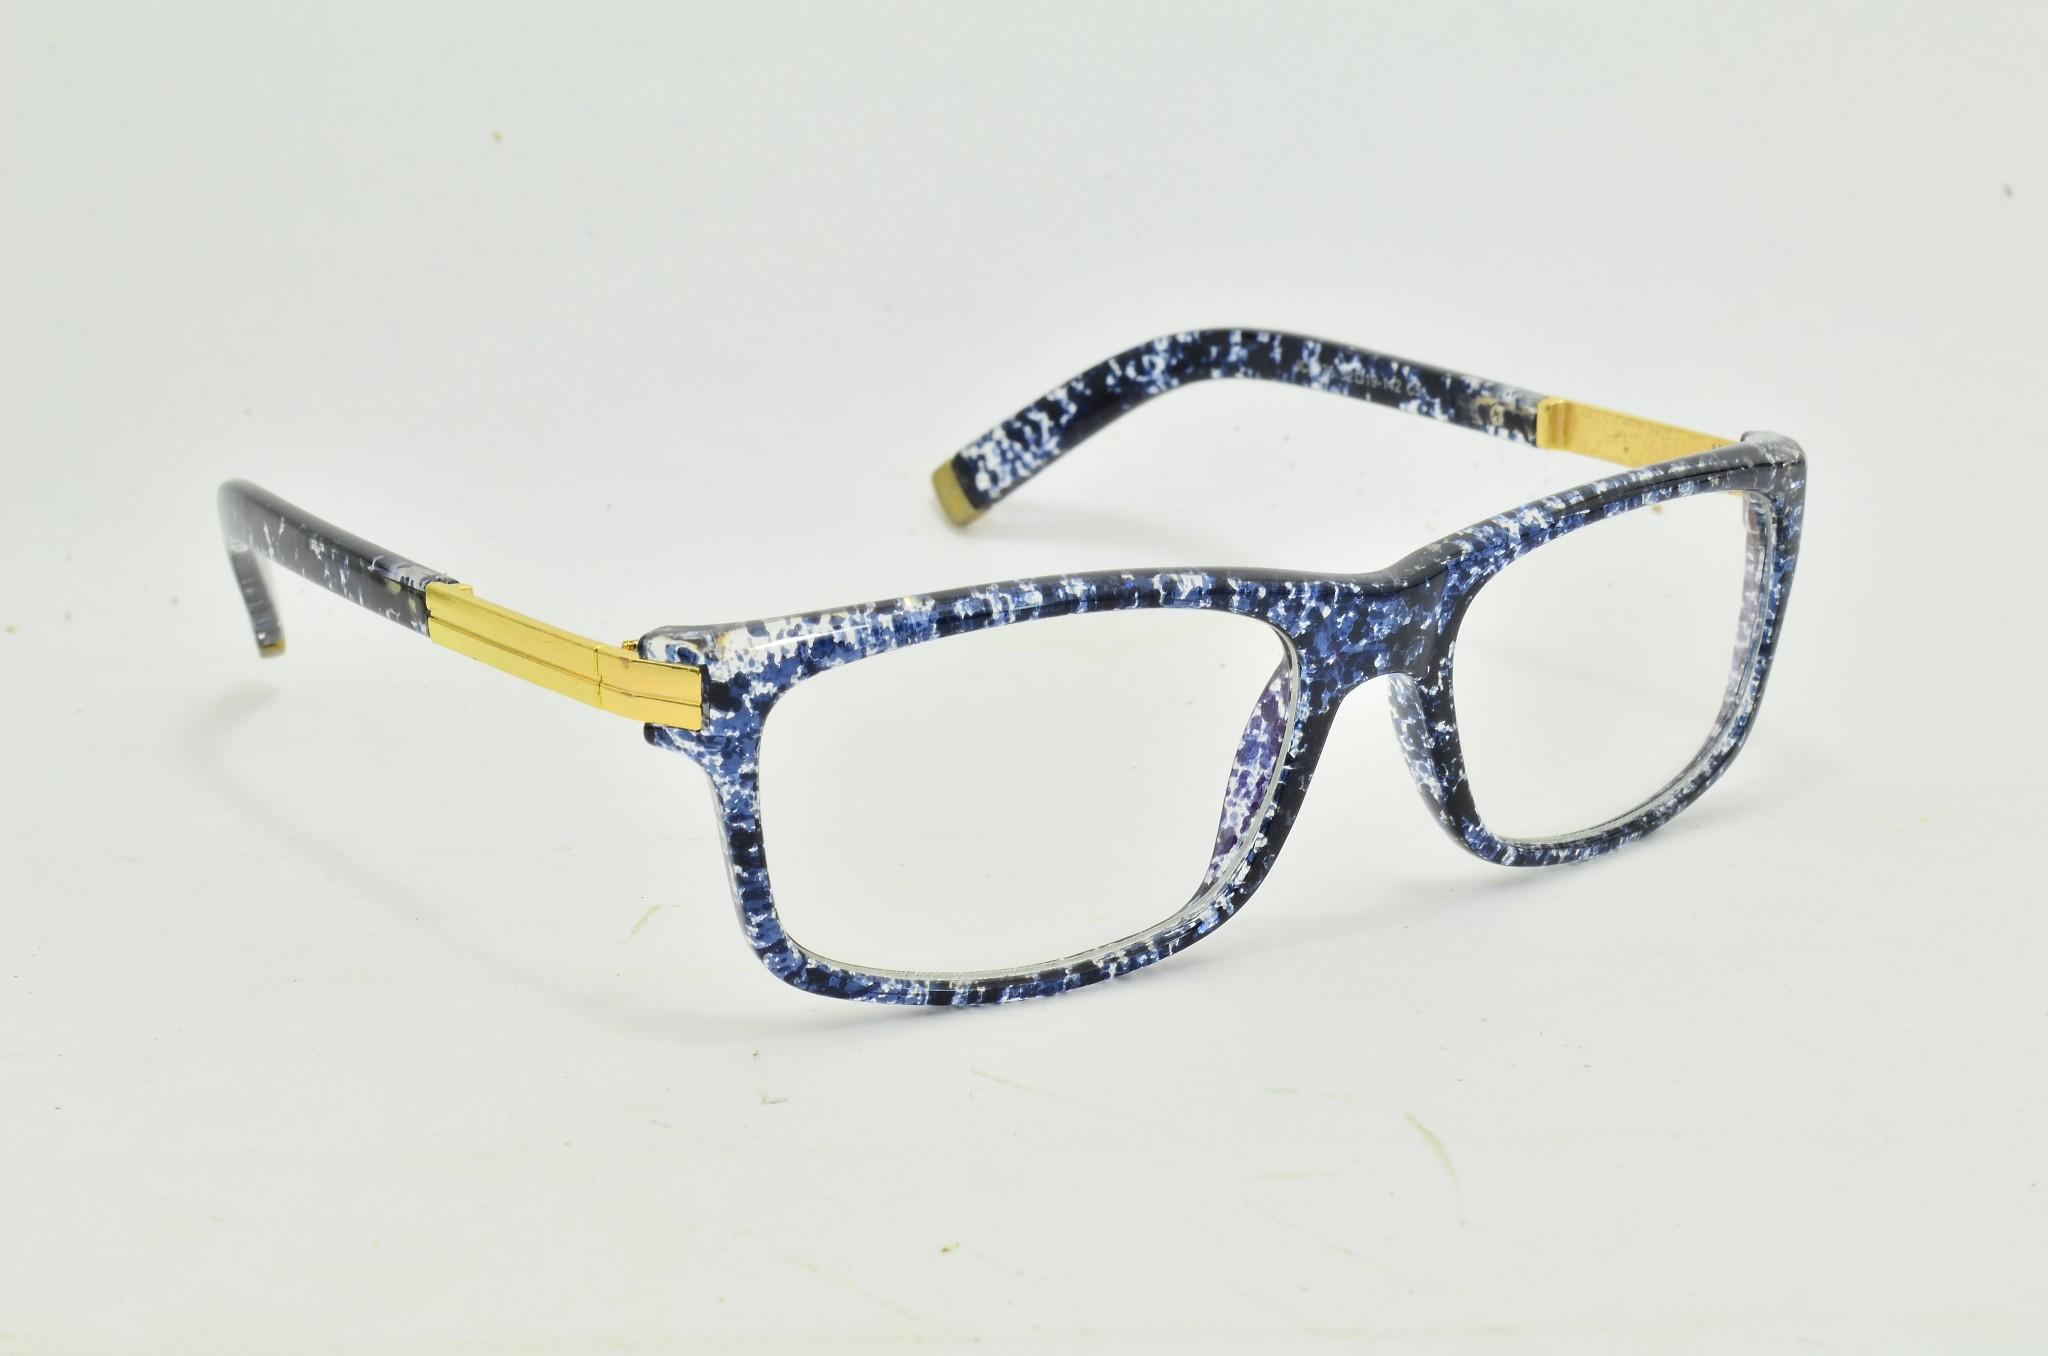 Jual Kacamata Korea Jc8125 Hitam Kombinasi